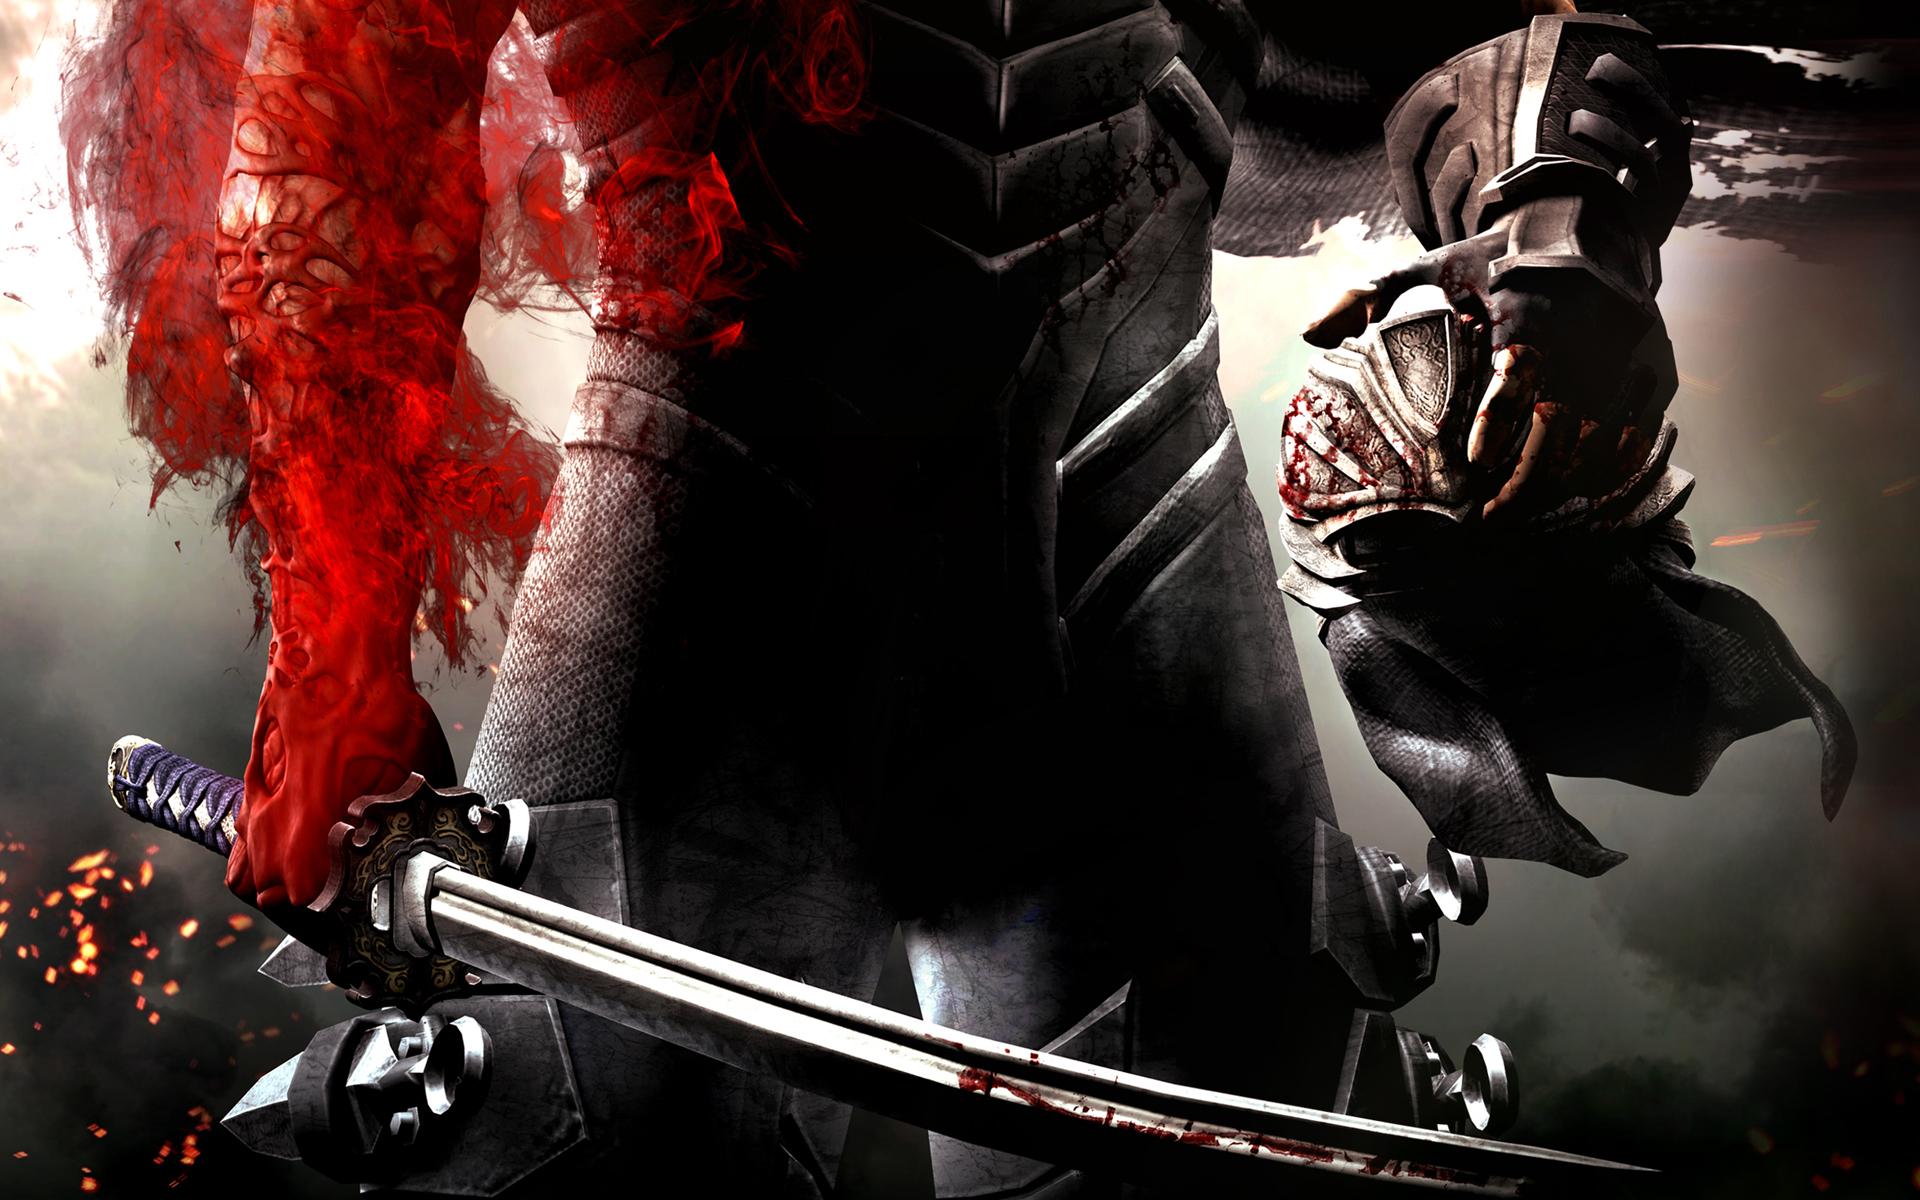 bloody sword wallpaper - photo #1